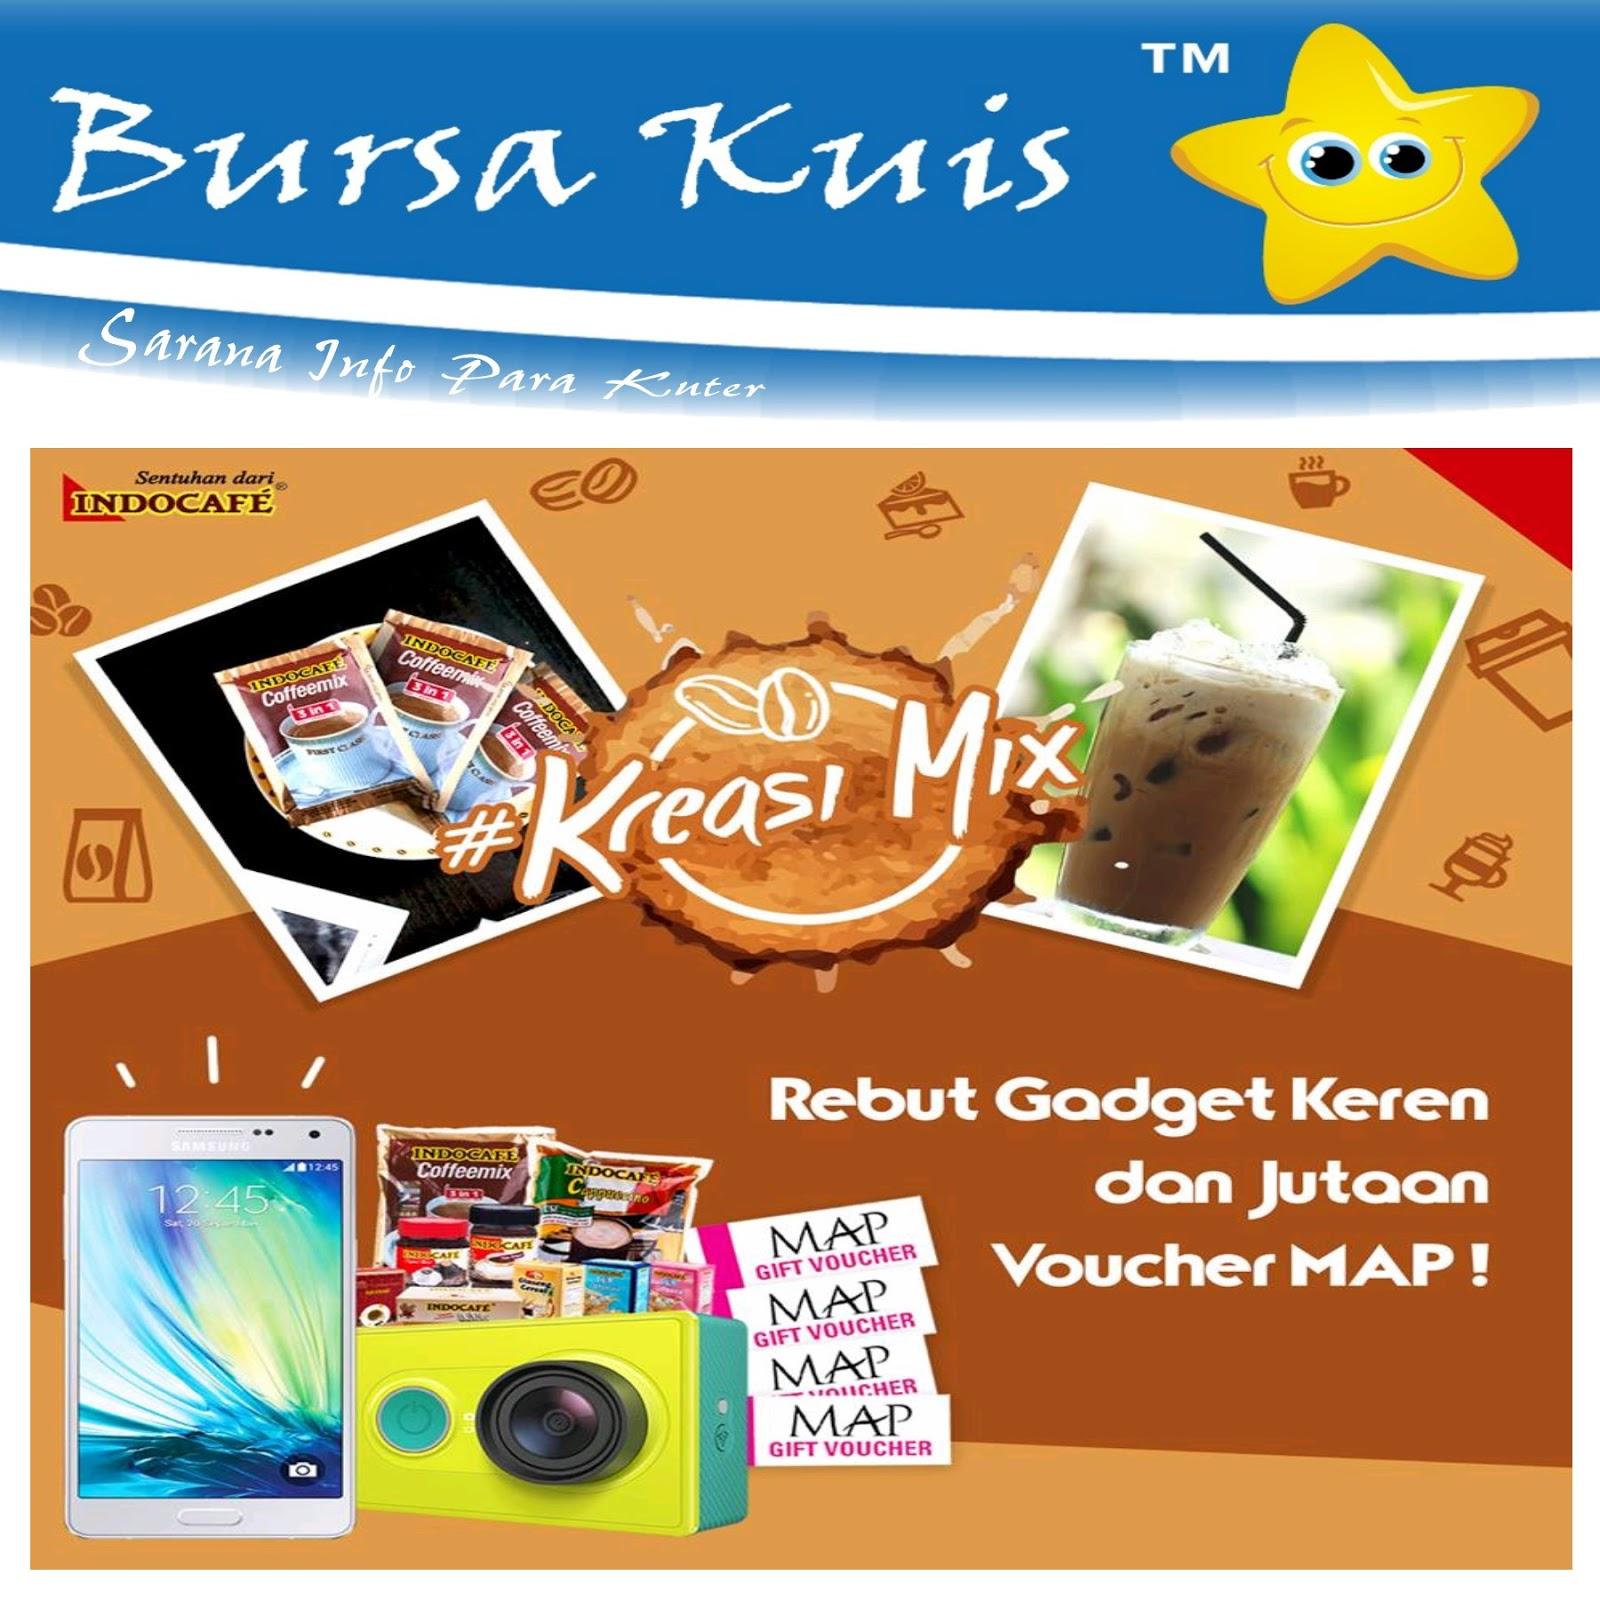 Kontes Foto Kreasi Mix Indocafe Berhadiah Gadget Dan Voucher Belanja Indomaret 2 Juta Jutaan Rupiah